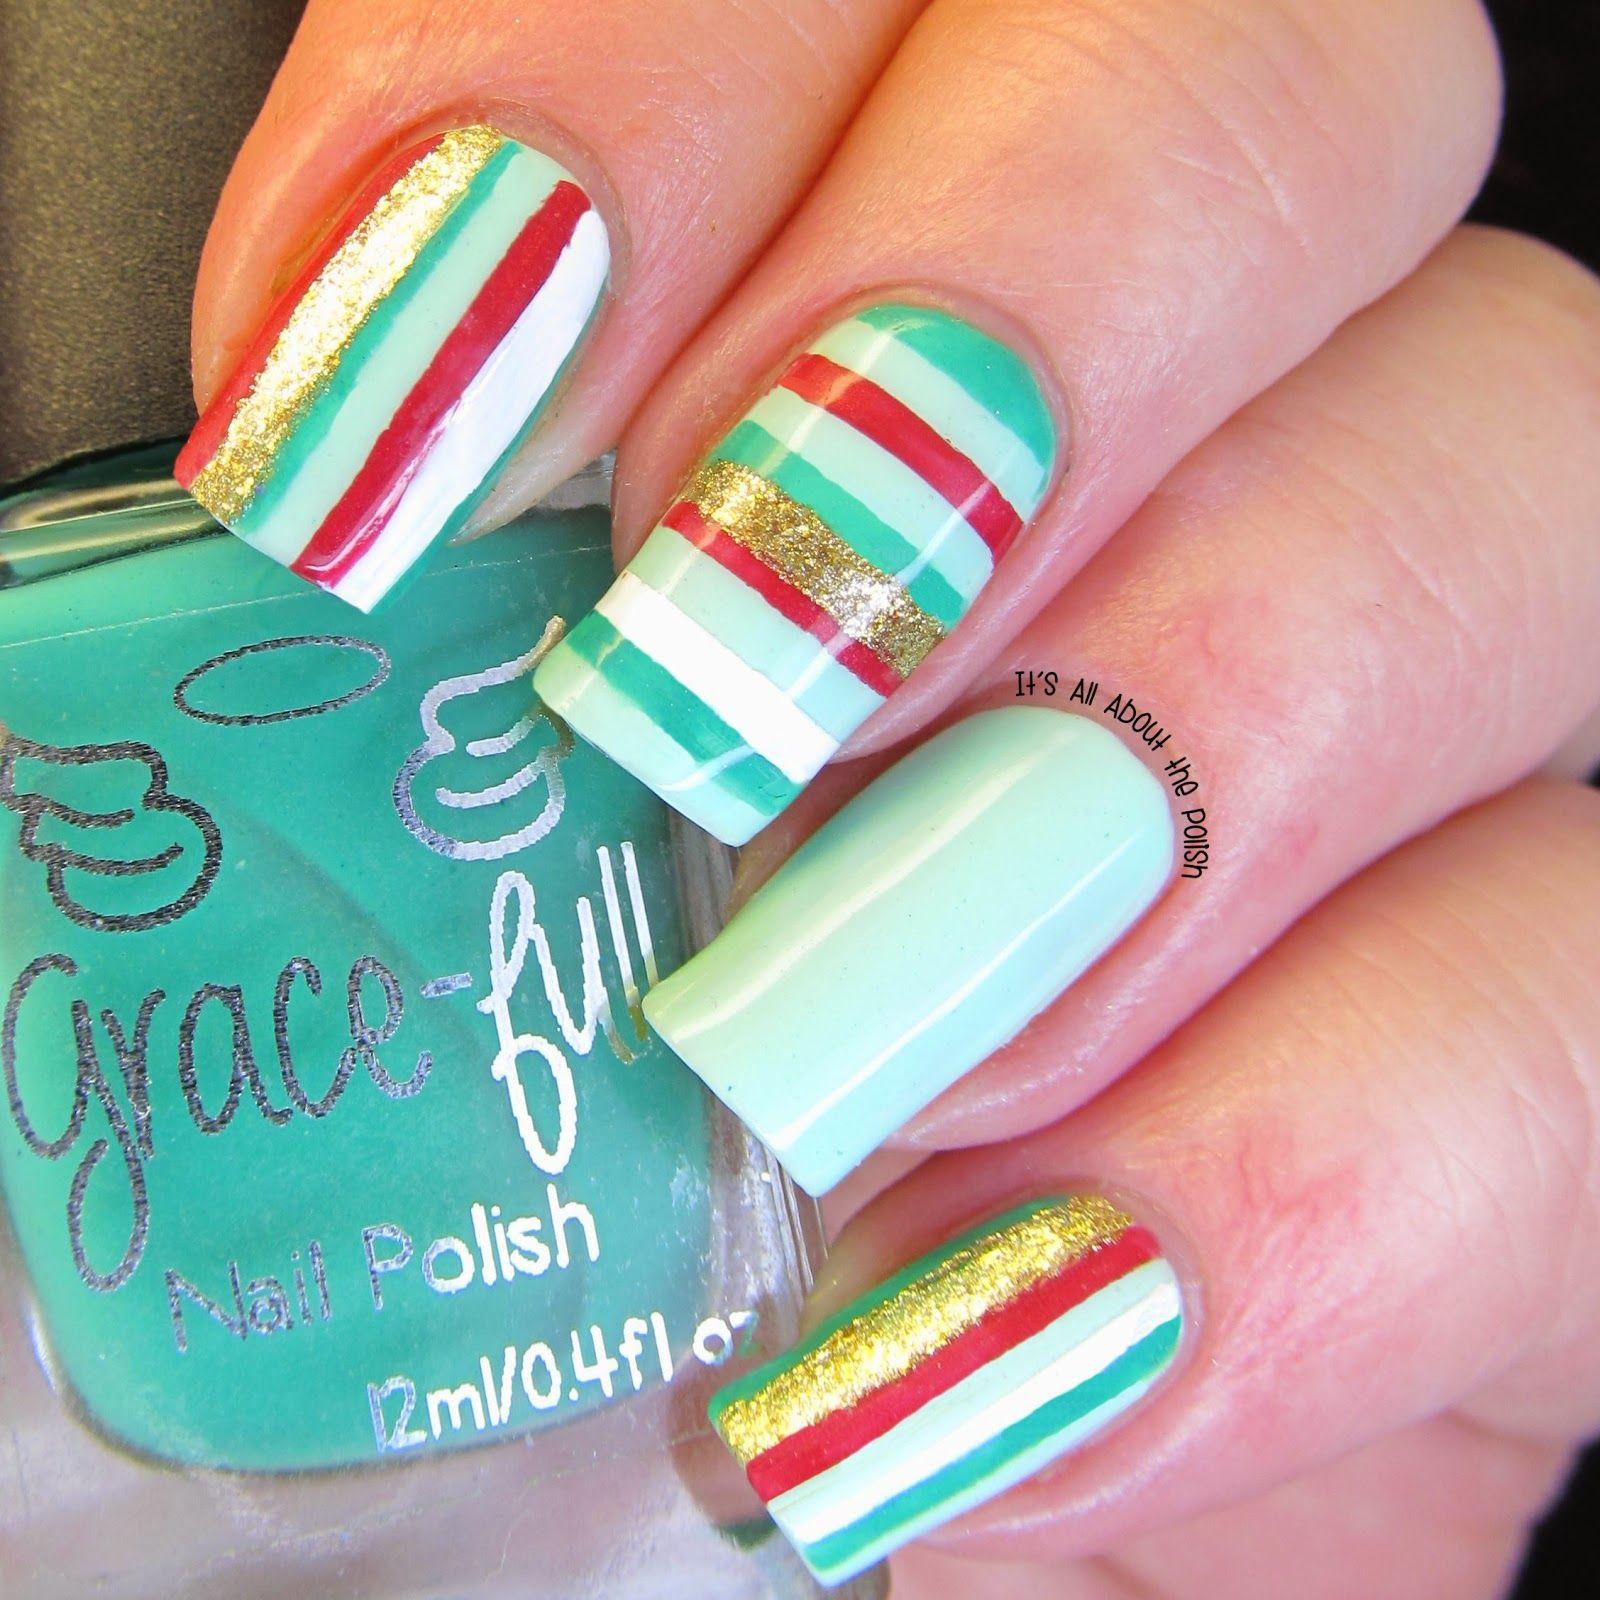 Concrete And Nail Polish Striped Nail Art: It's All About The Polish: Christmas Stripes Nail Art